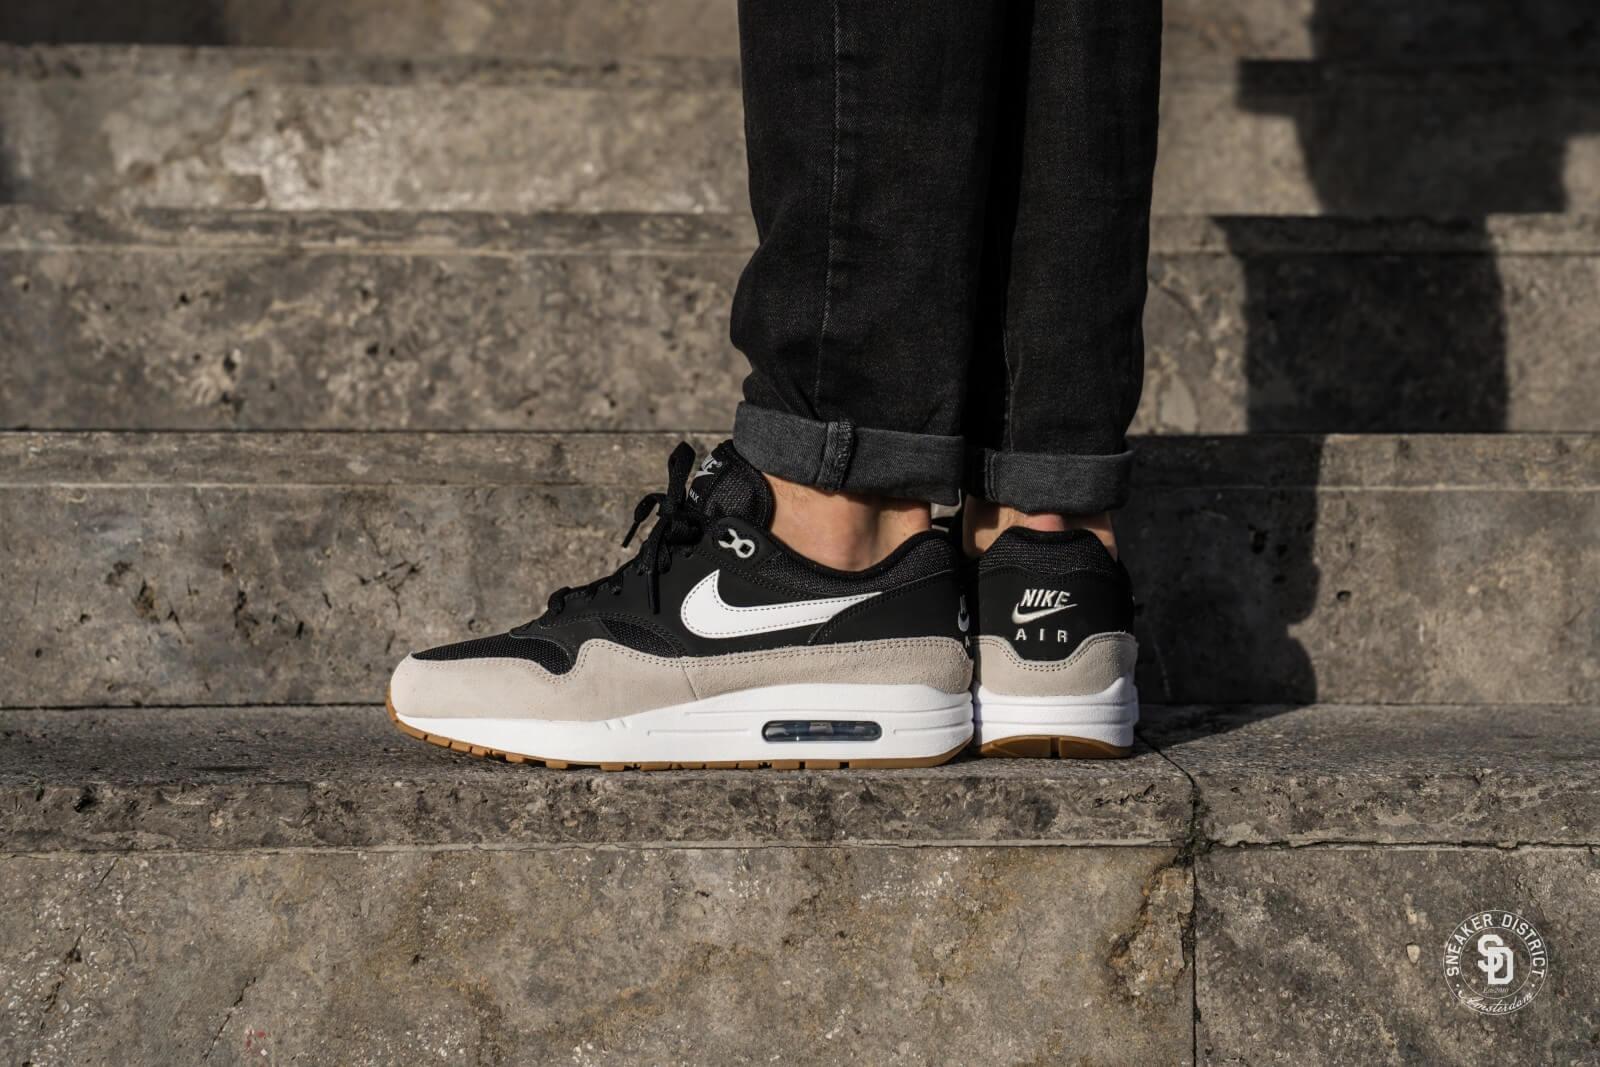 Nike Air Max 1 Black Light Bone Nike ah8145 009